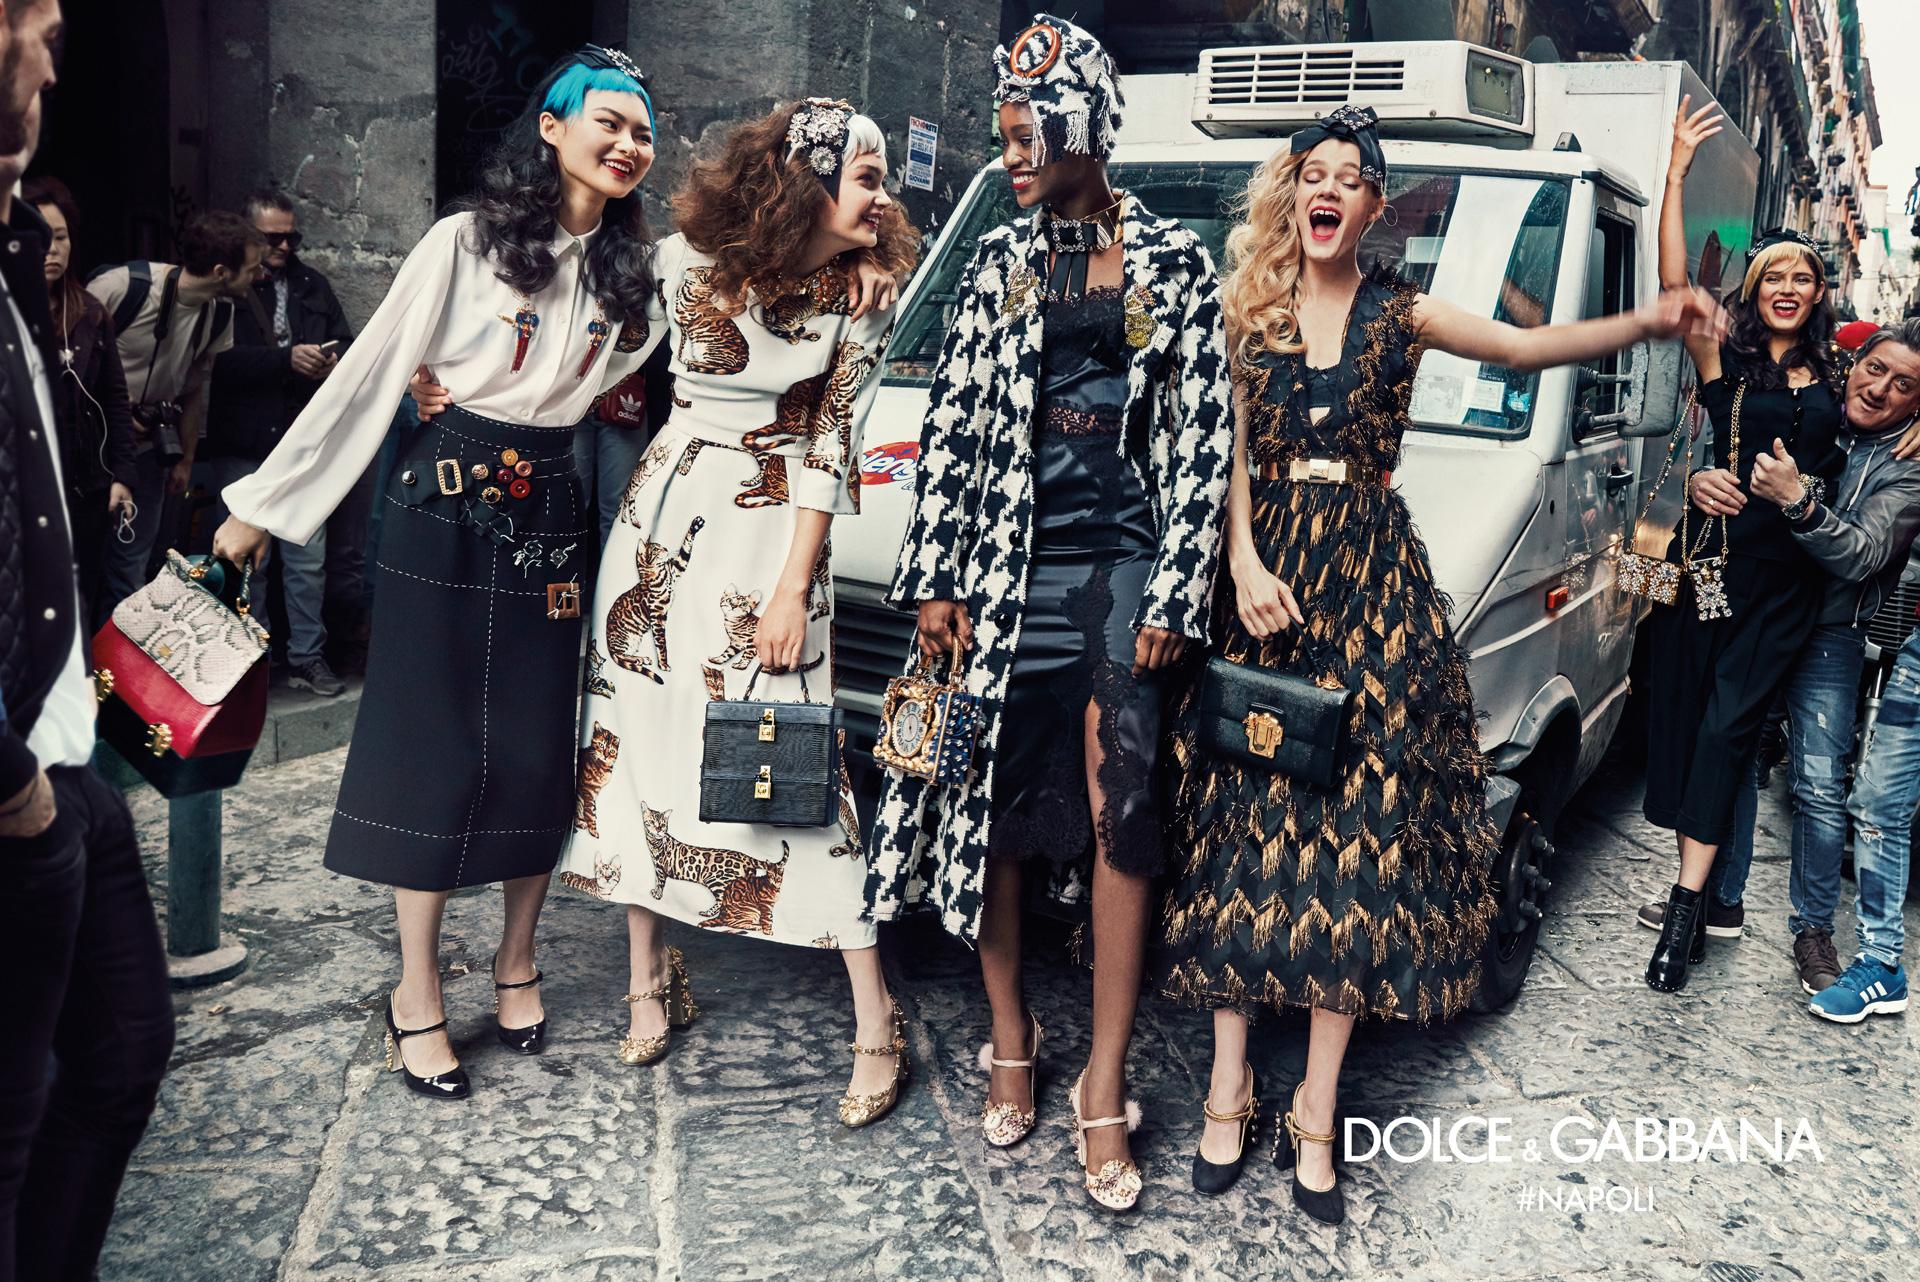 Dolce-Gabbana-Fall-Winter-2016-2017-Ad-Campaign-Naples-9